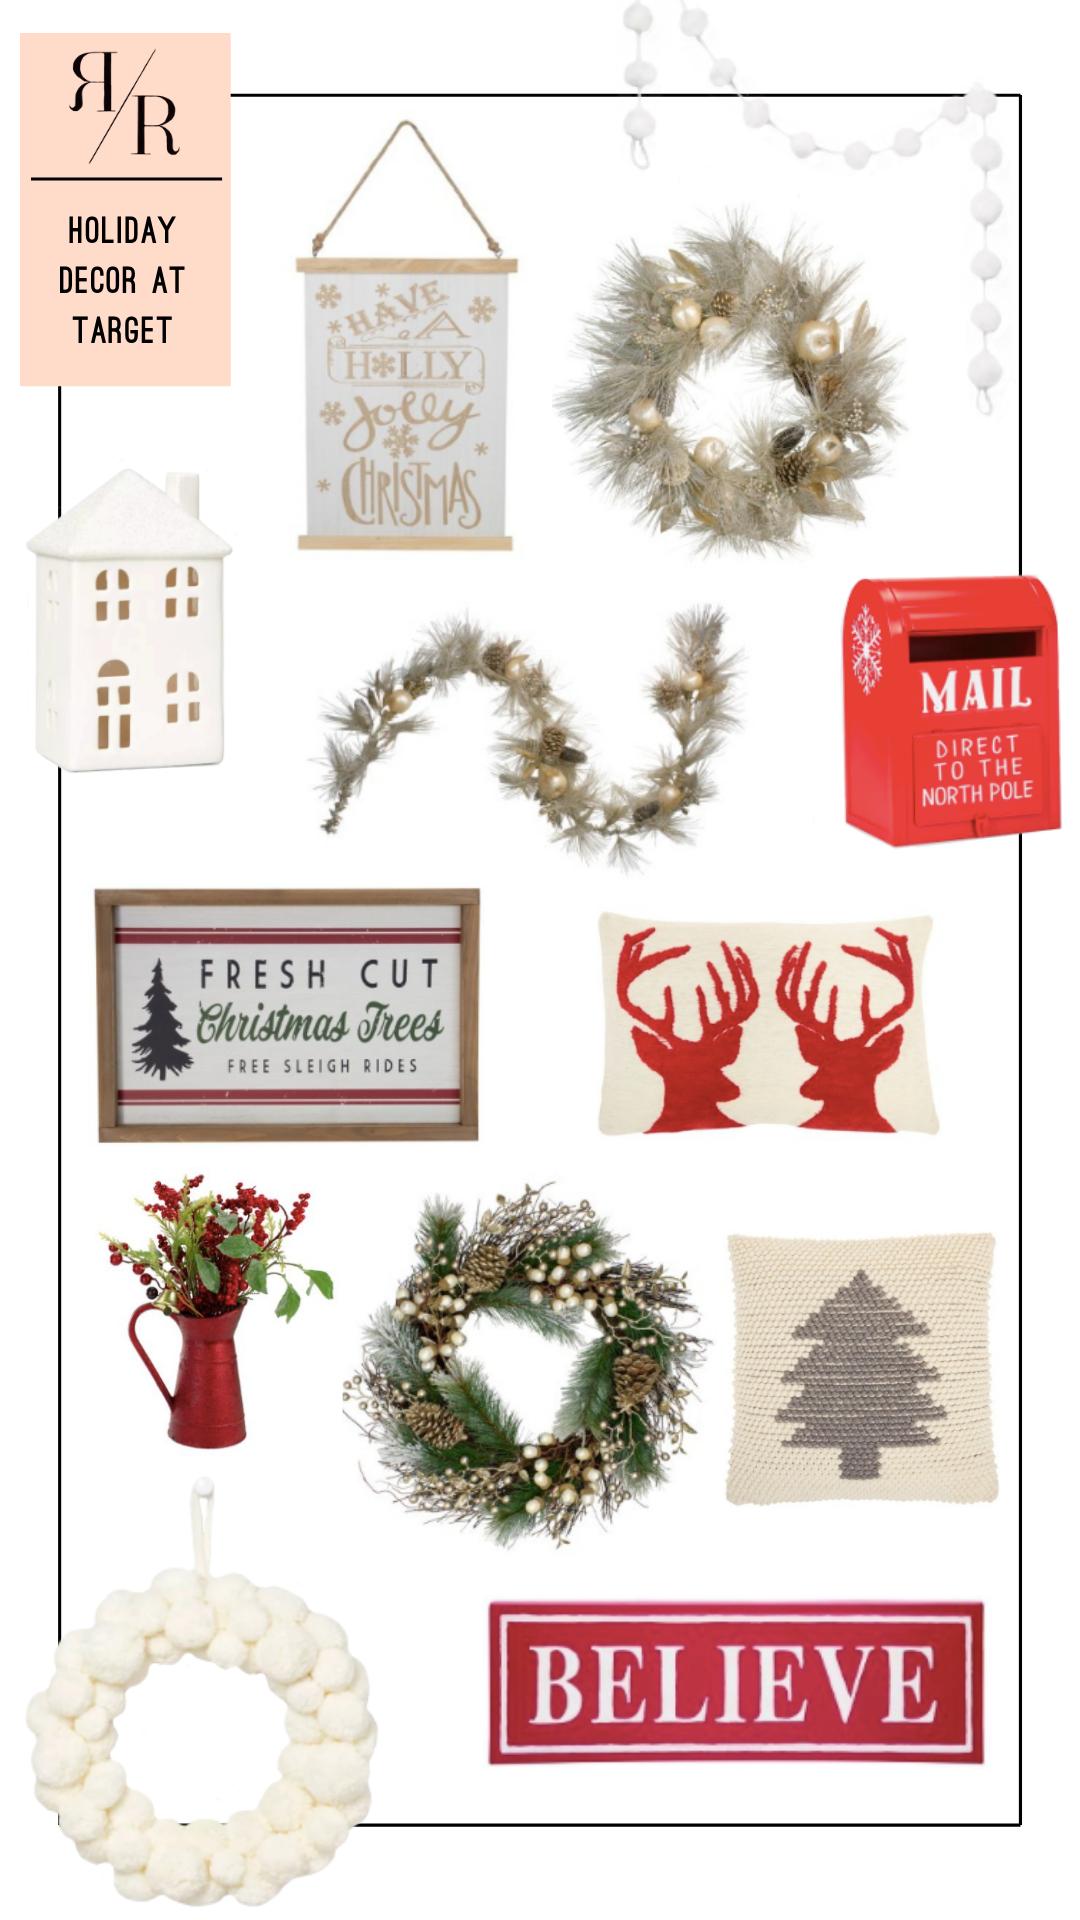 Ruthie Ridley Blog Holiday Decor At Target